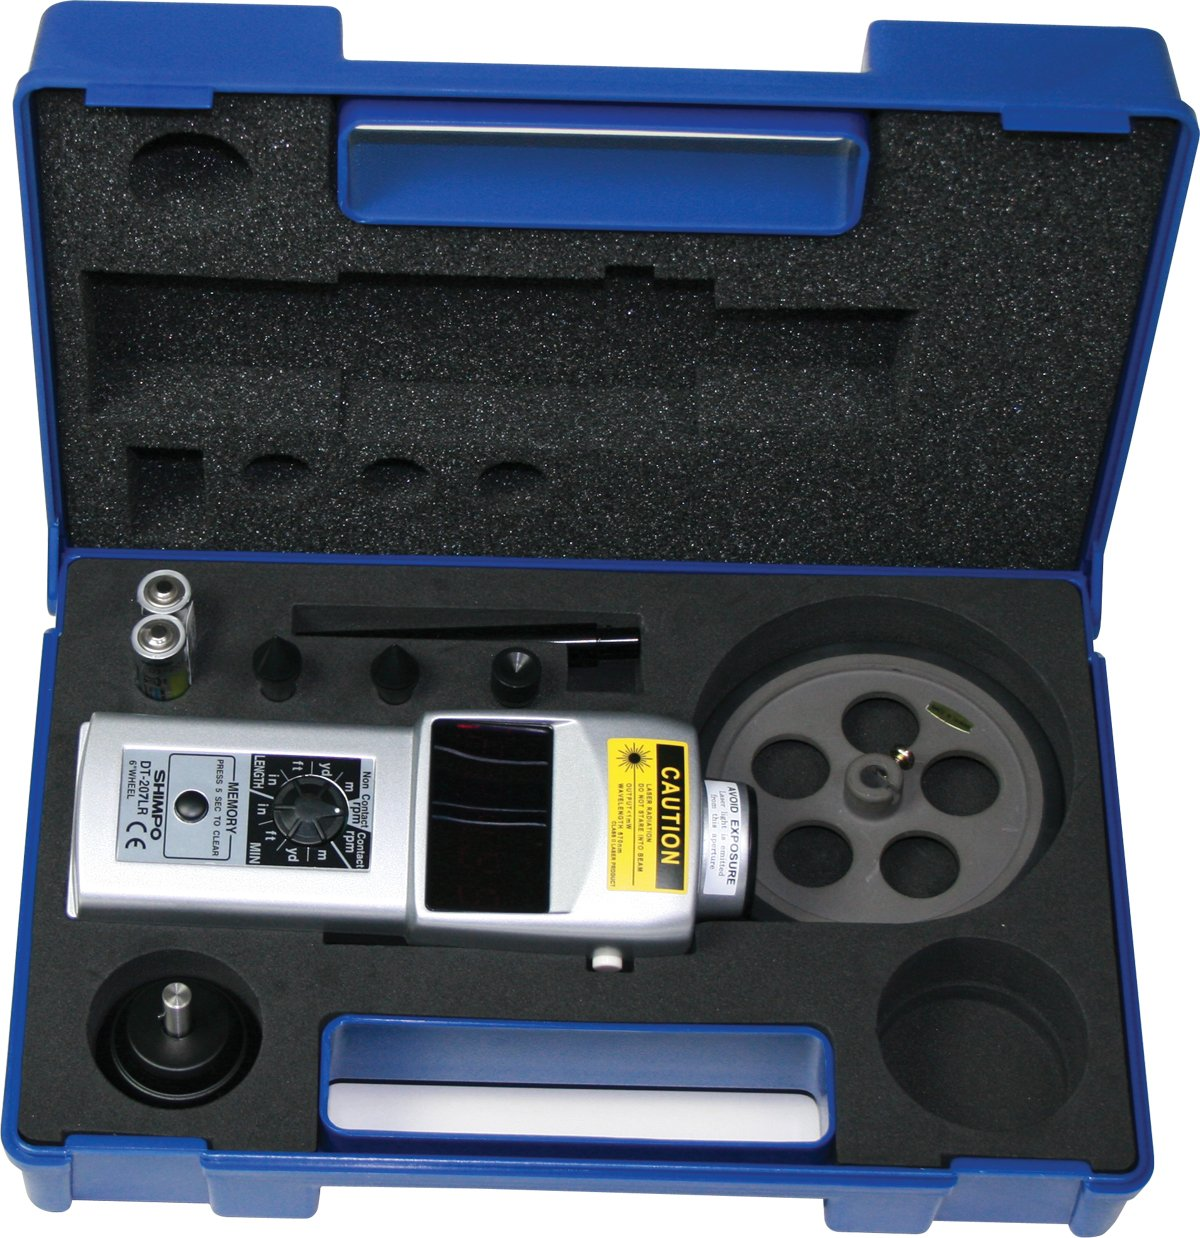 "Shimpo DT-207LR-S12 Handheld Tachometer with 12"" Wheel, LED Display, 6 - 99999rpm Range"